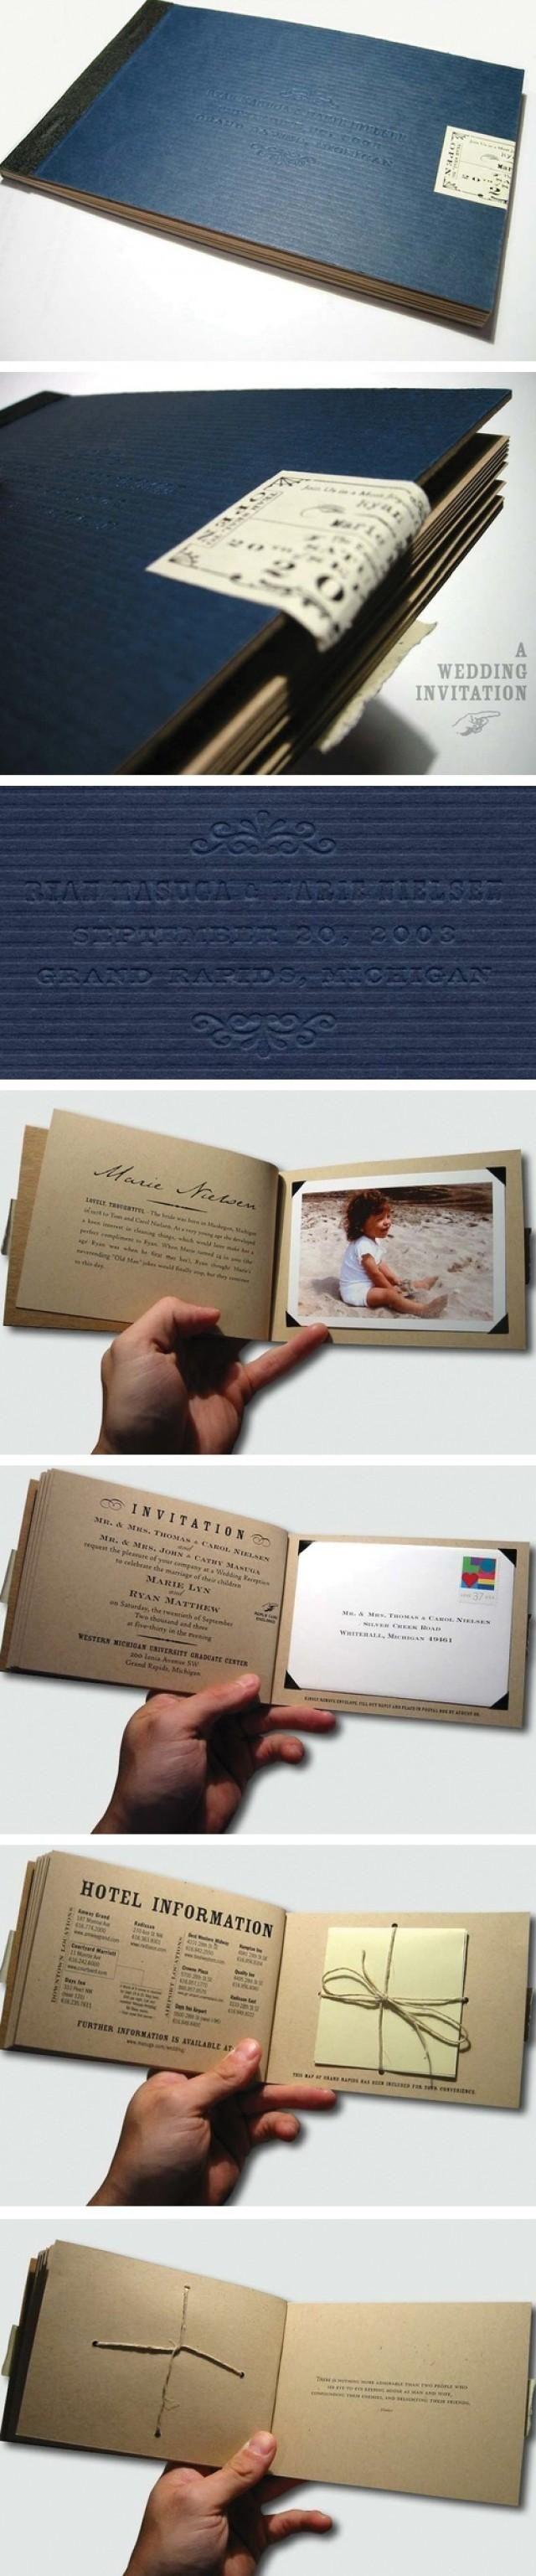 Beautiful InvitationBooklets modern